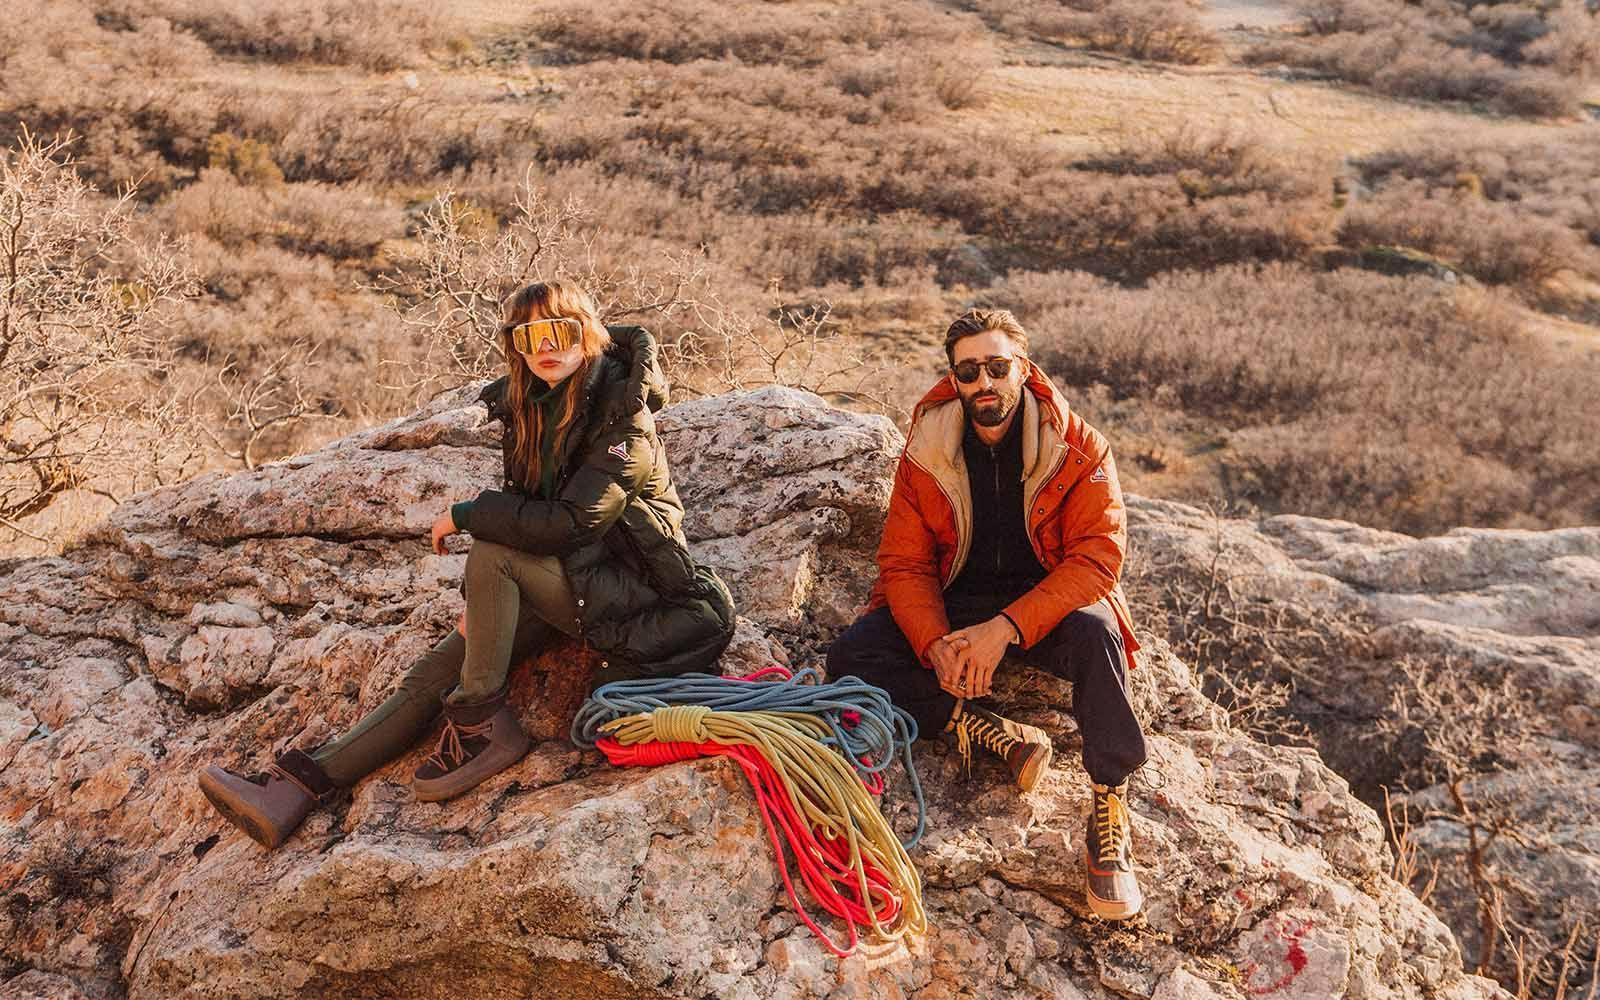 Outdoor Clothing Pioneer Holubar Revives Parka of Robert De Niro Fame